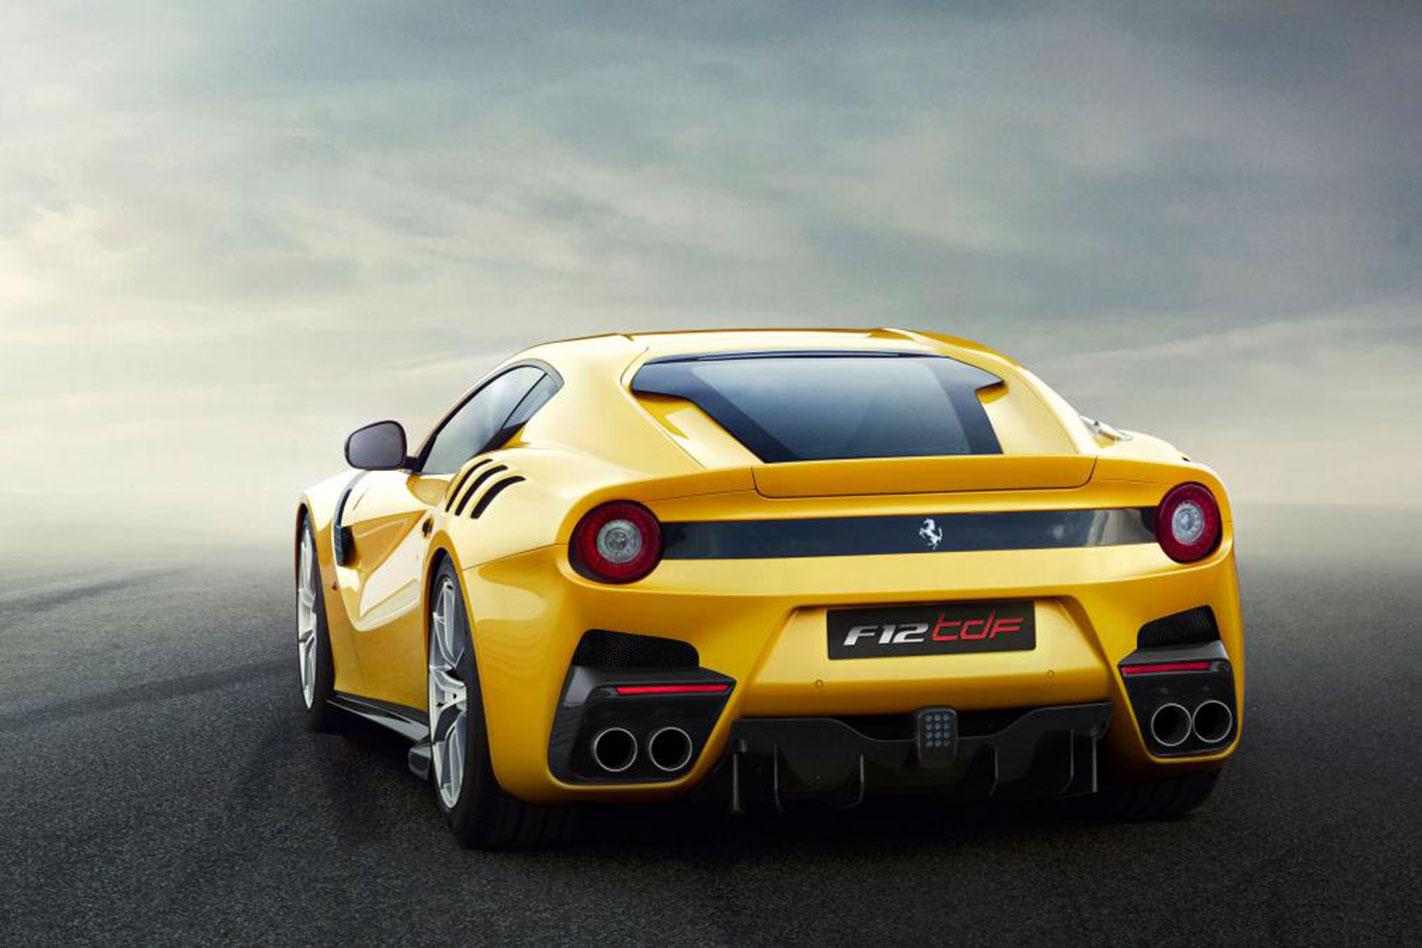 Ferrari -F12tdf -rear